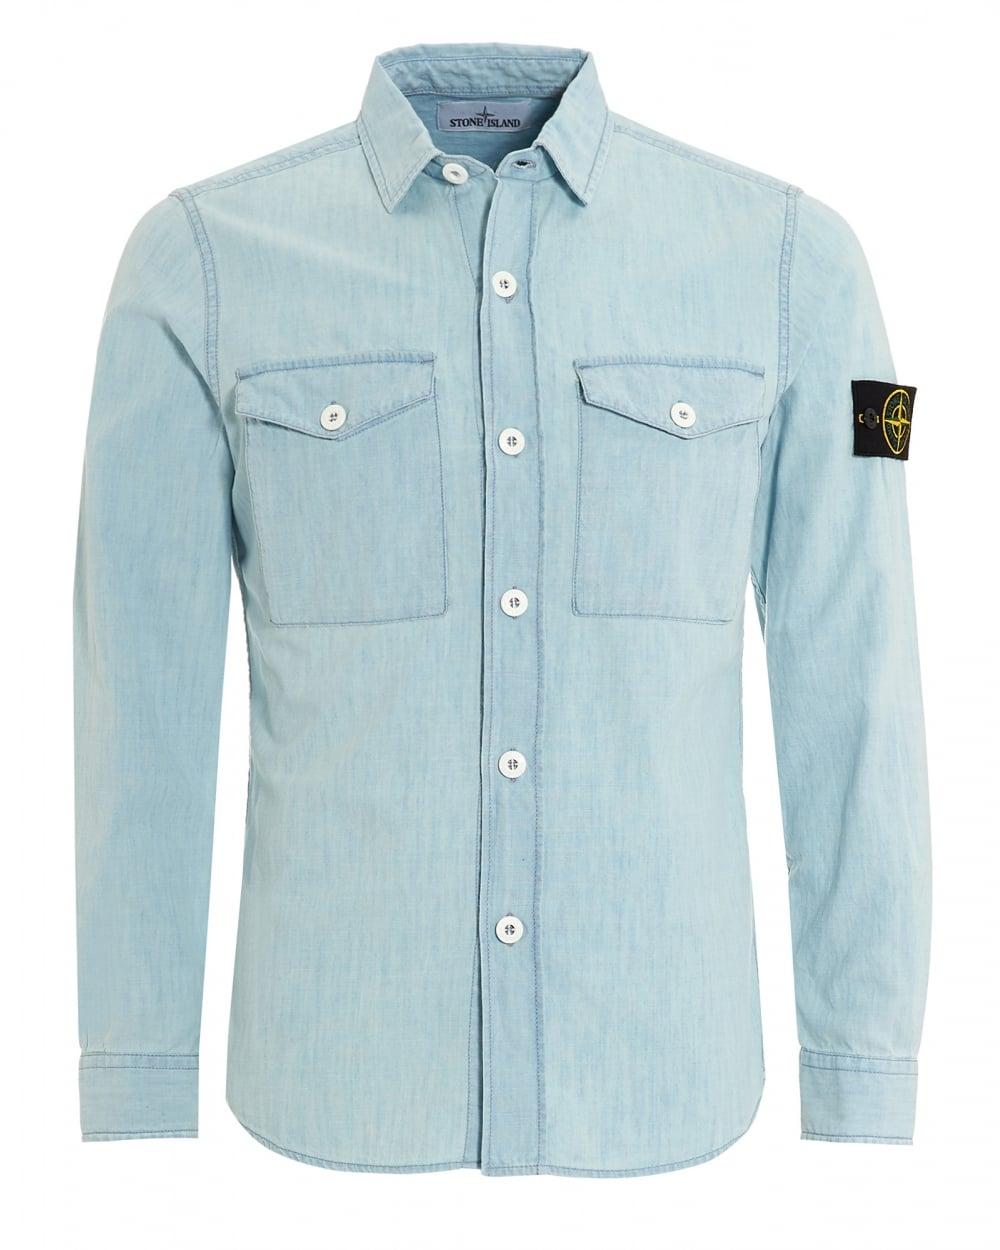 Stone Island Mens Shirt Light Blue Chambray Bleach Denim